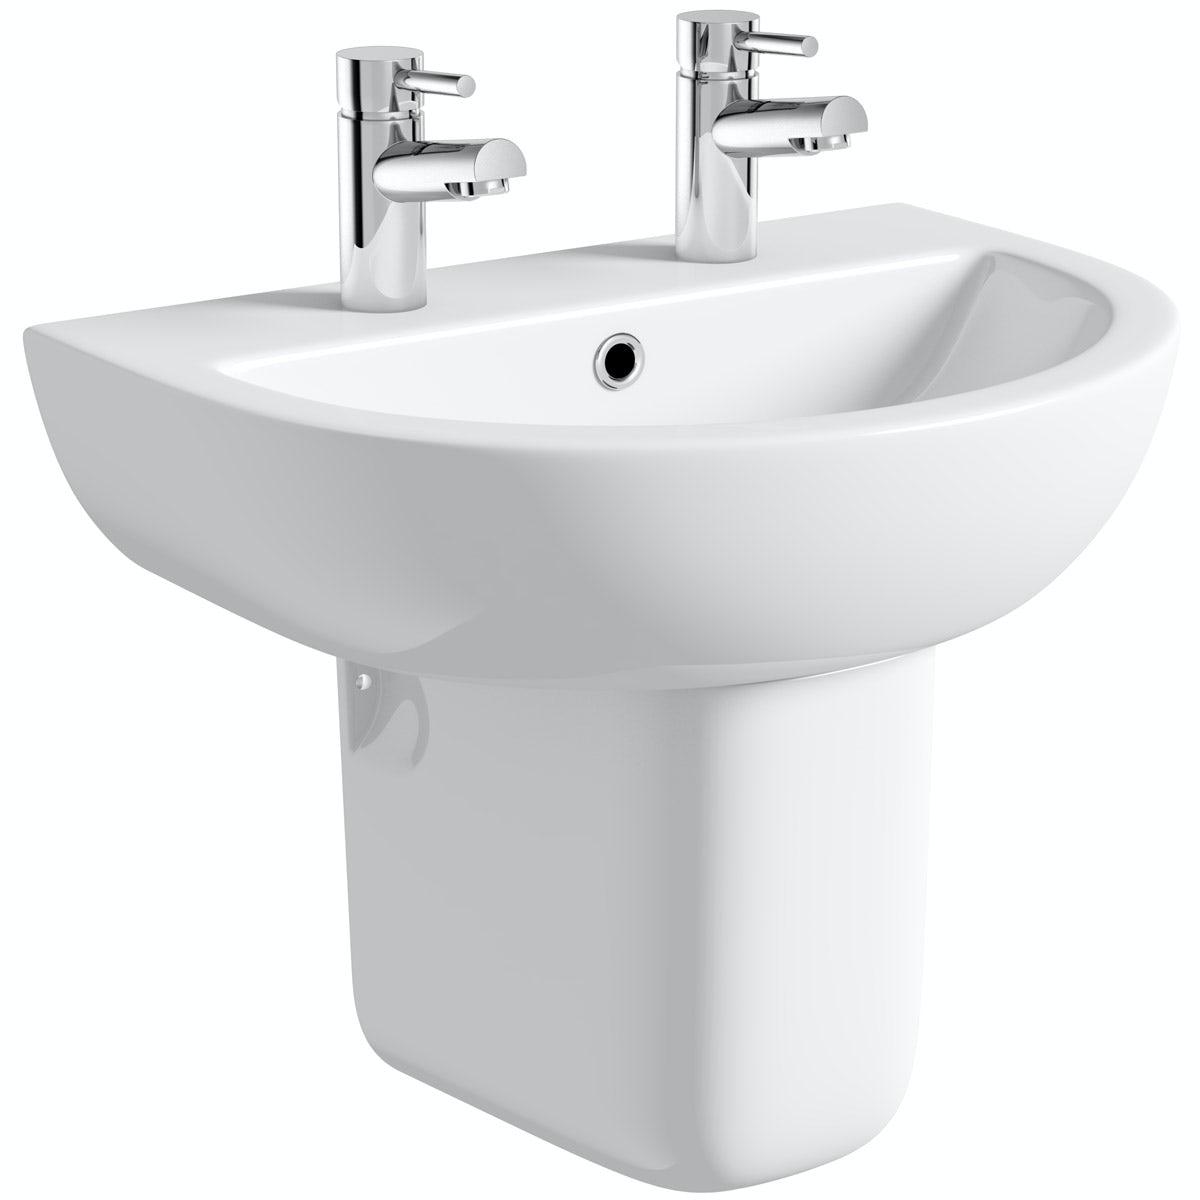 Orchard Elena 2 tap hole semi pedestal basin